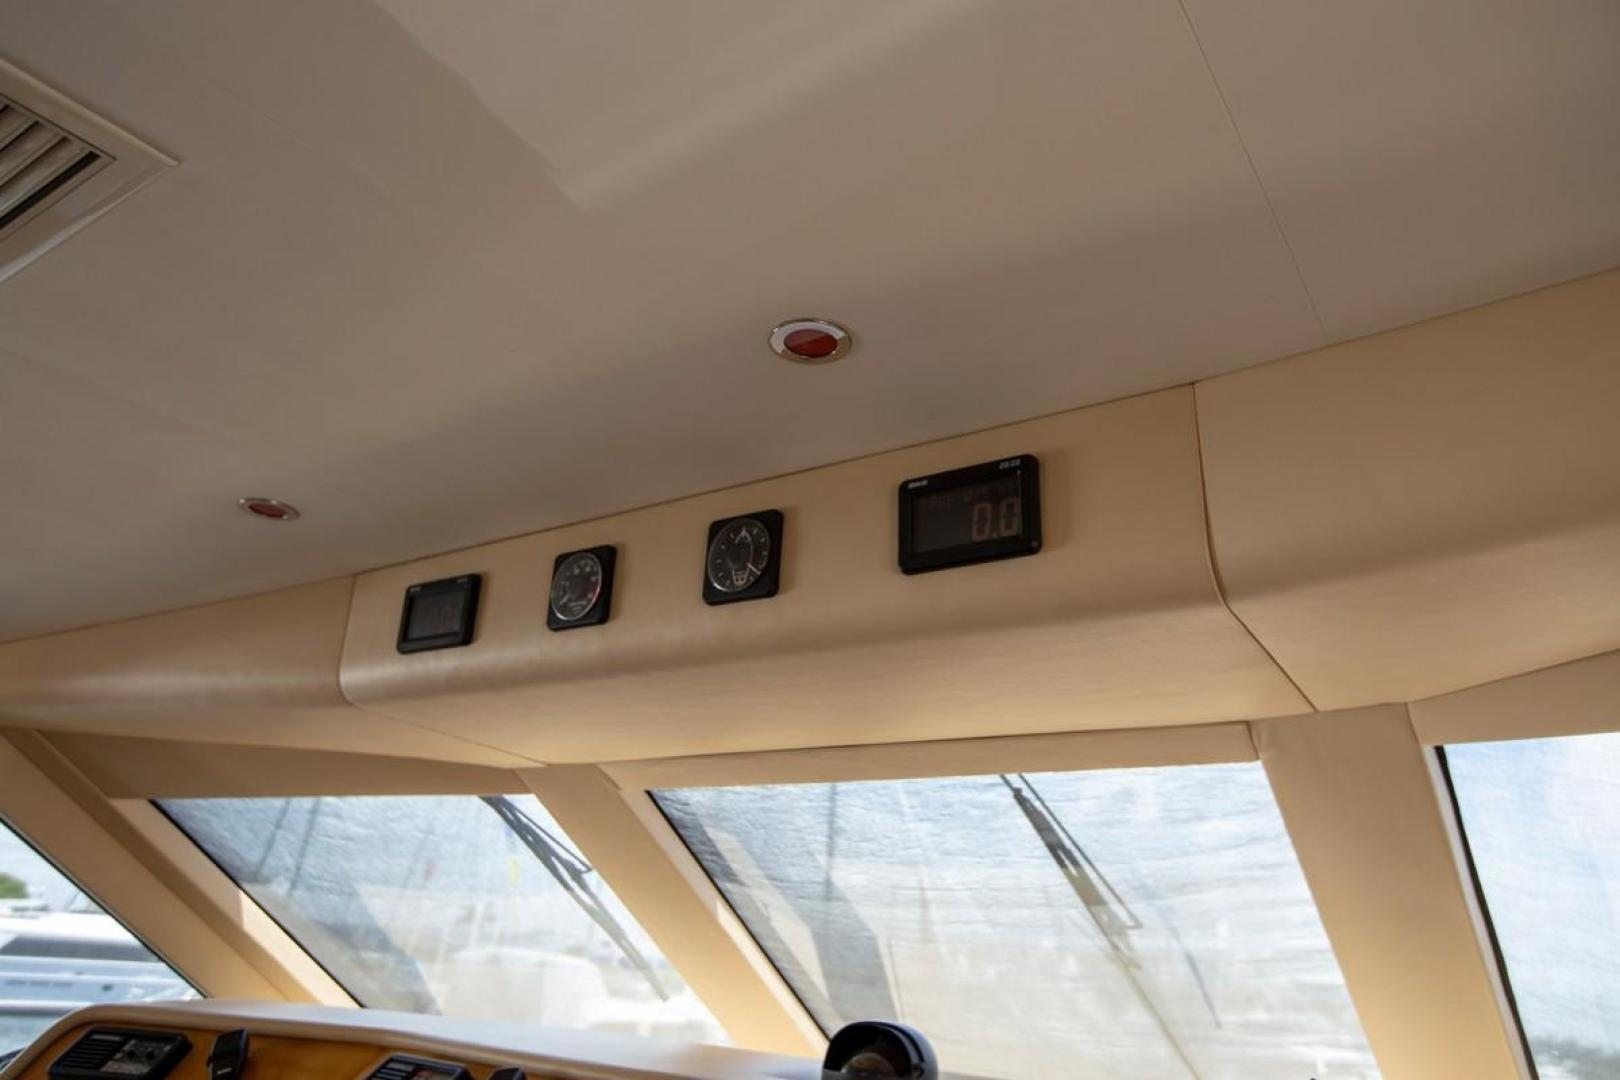 Hatteras-Cockpit Motor Yacht 2000-Getaway Ft. Lauderdale-Florida-United States-977375 | Thumbnail